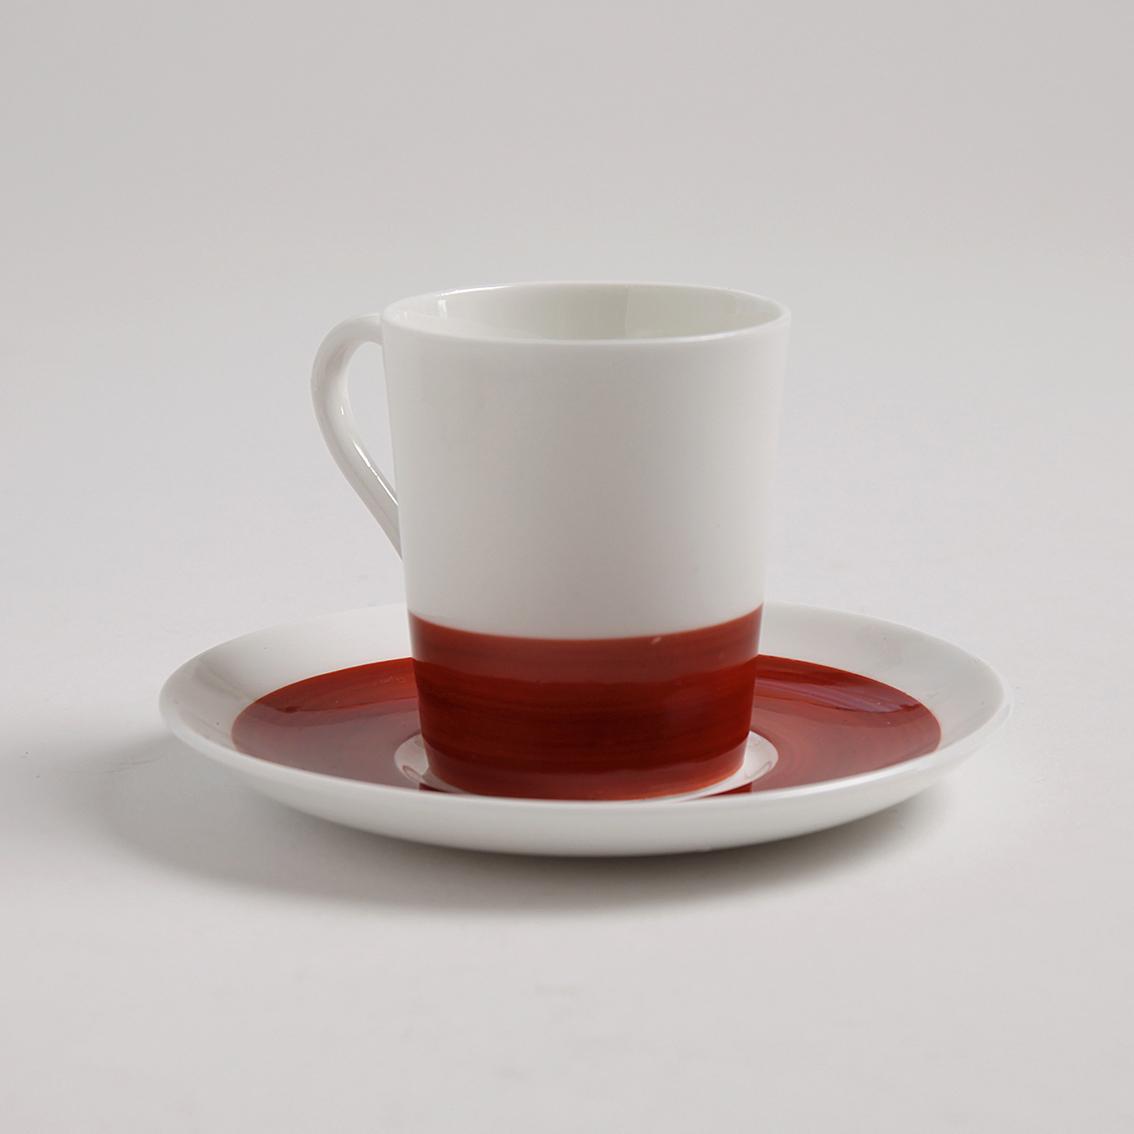 Gustavsberg  Gustavsberg  グスタフスベリ Color カラー デミタスコーヒーカップ&ソーサー(レッド) 北欧ヴィンテージ